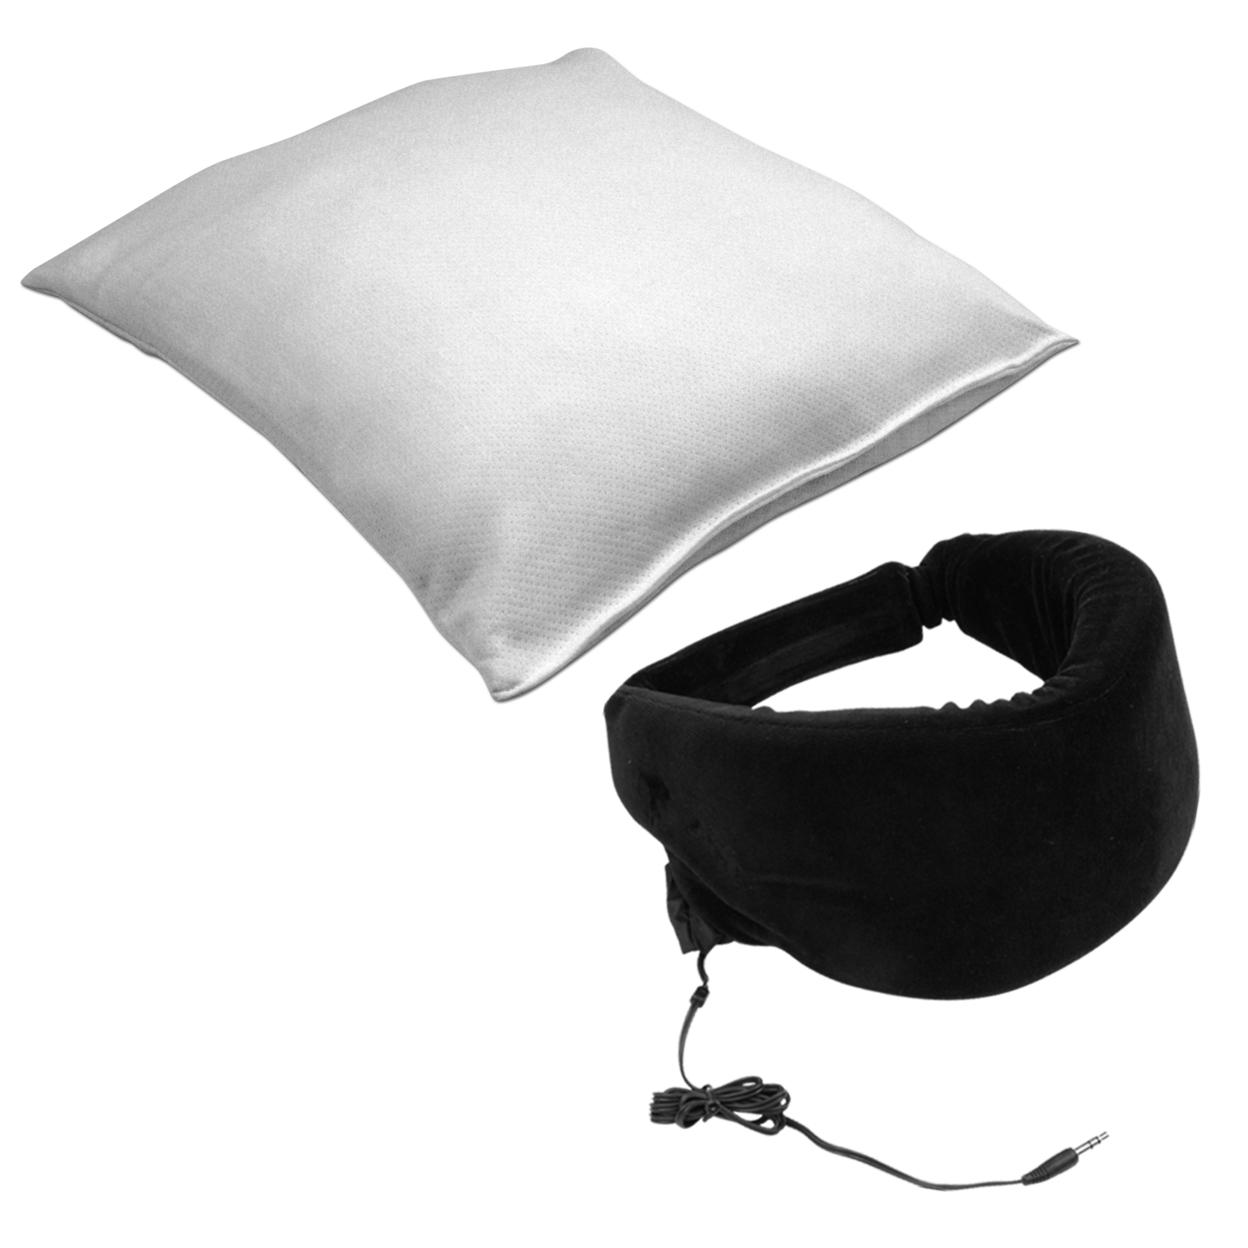 Remedy Memory Foam Pillow/Heat Sensitive Sleep Mask